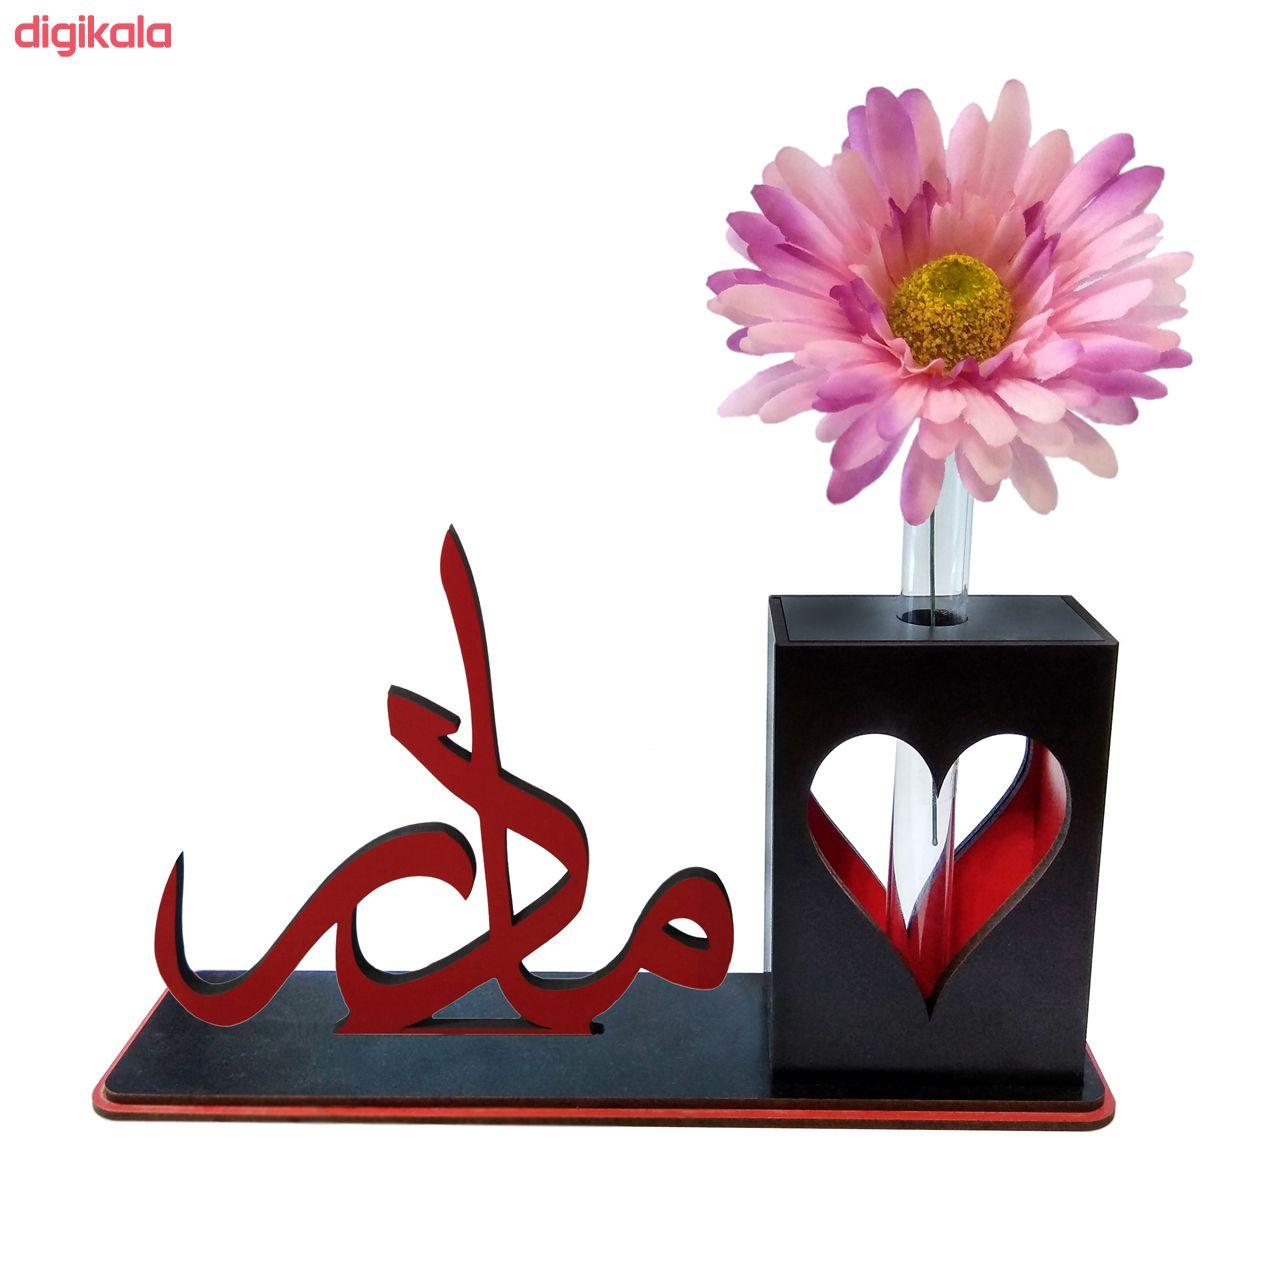 گلدان به همراه گل مصنوعی مهدی یار طرح مادر main 1 1